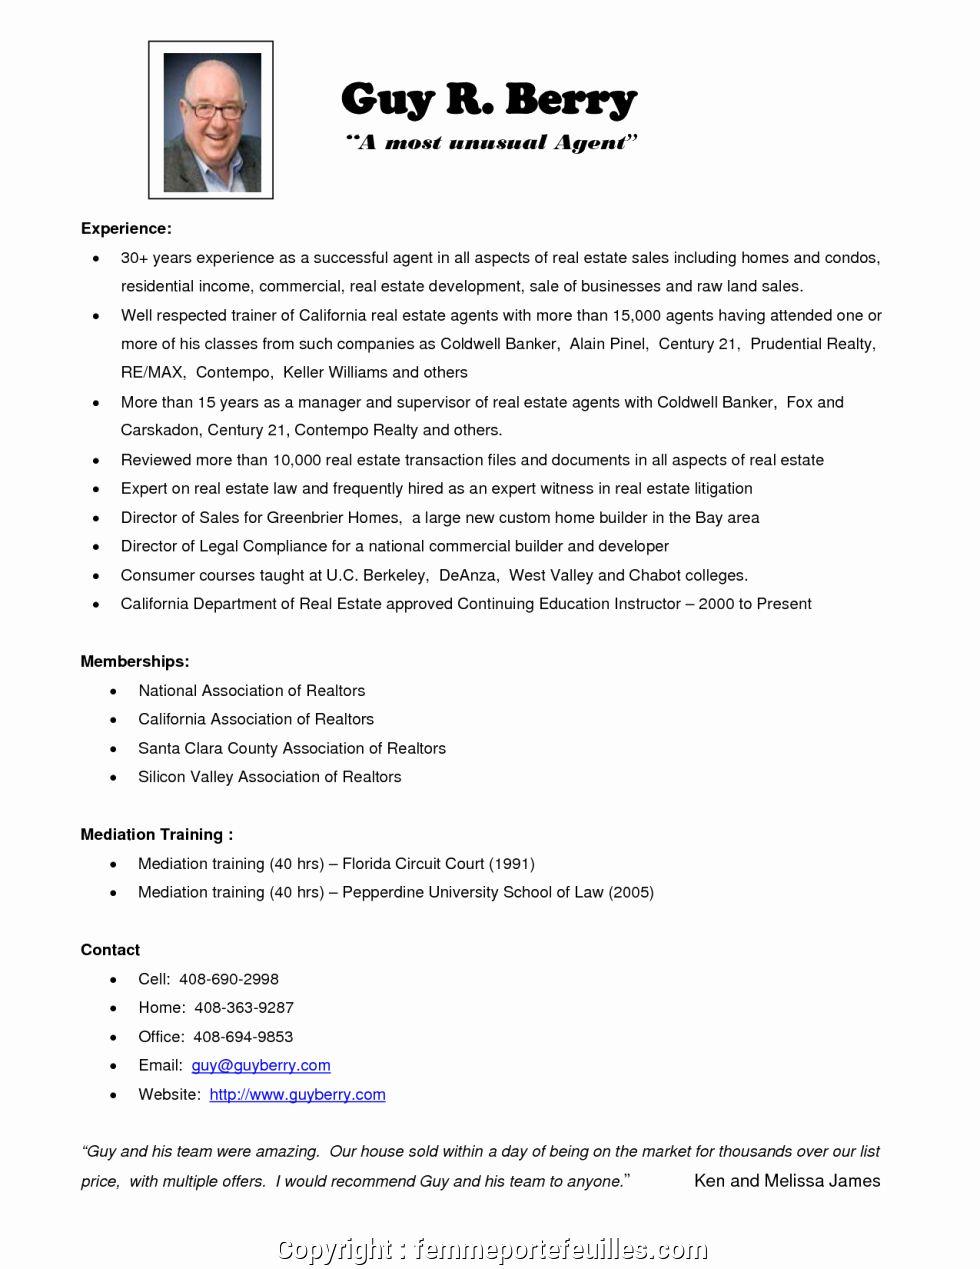 20 Real Estate Agent Resume Job Description in 2020 Good